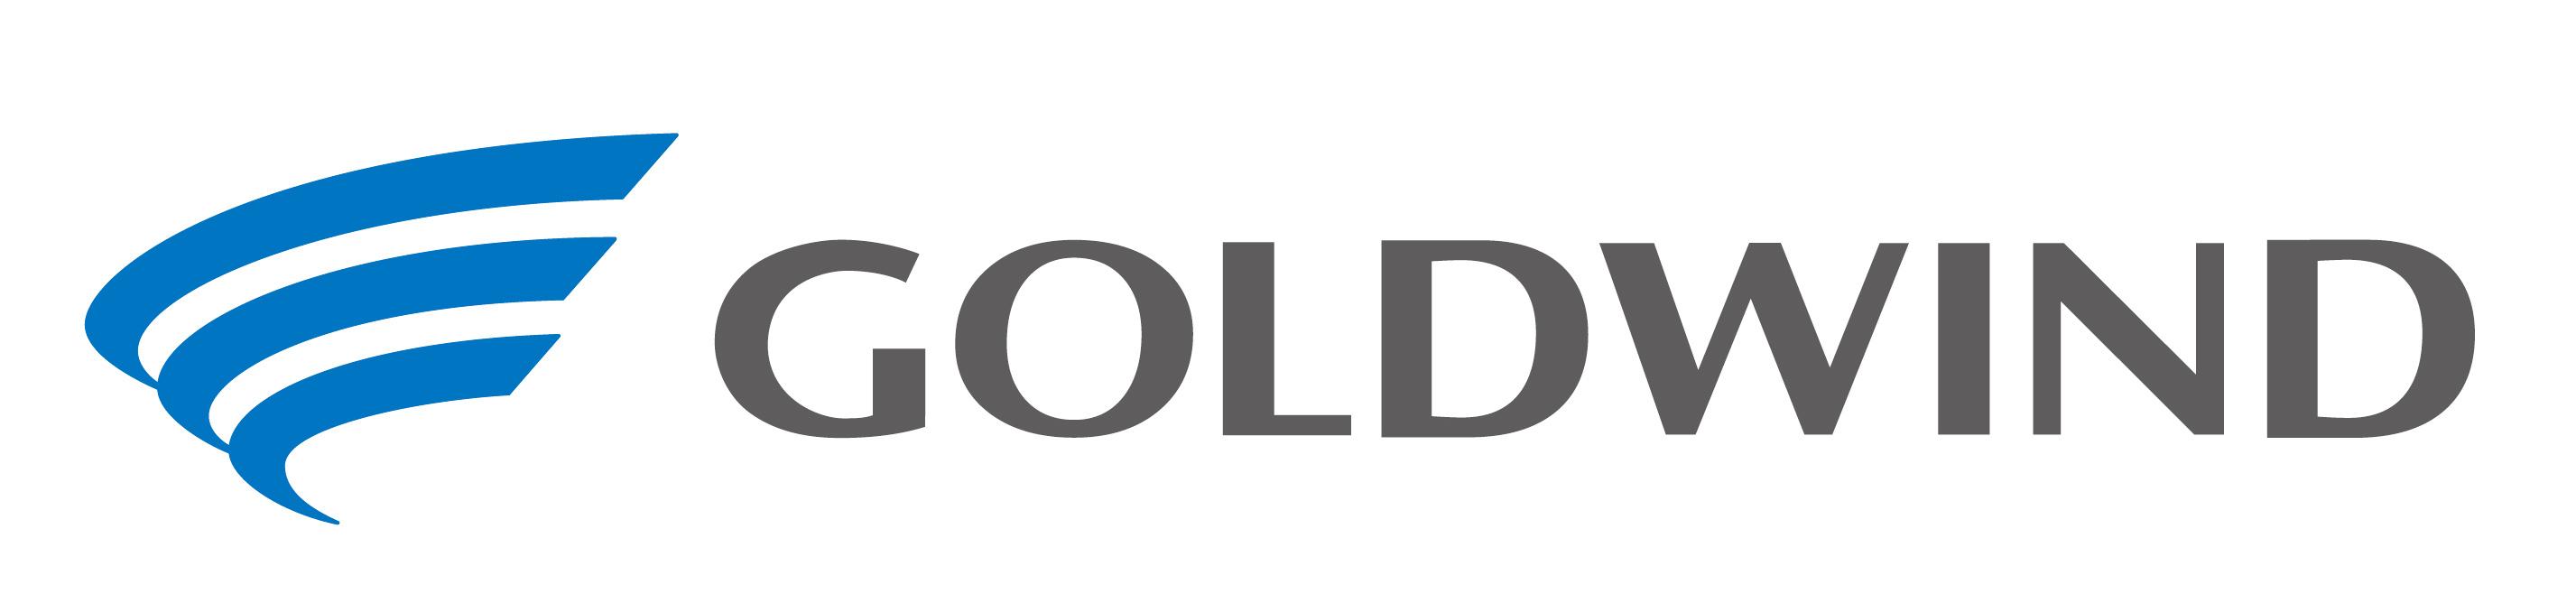 Goldwind logo cropped